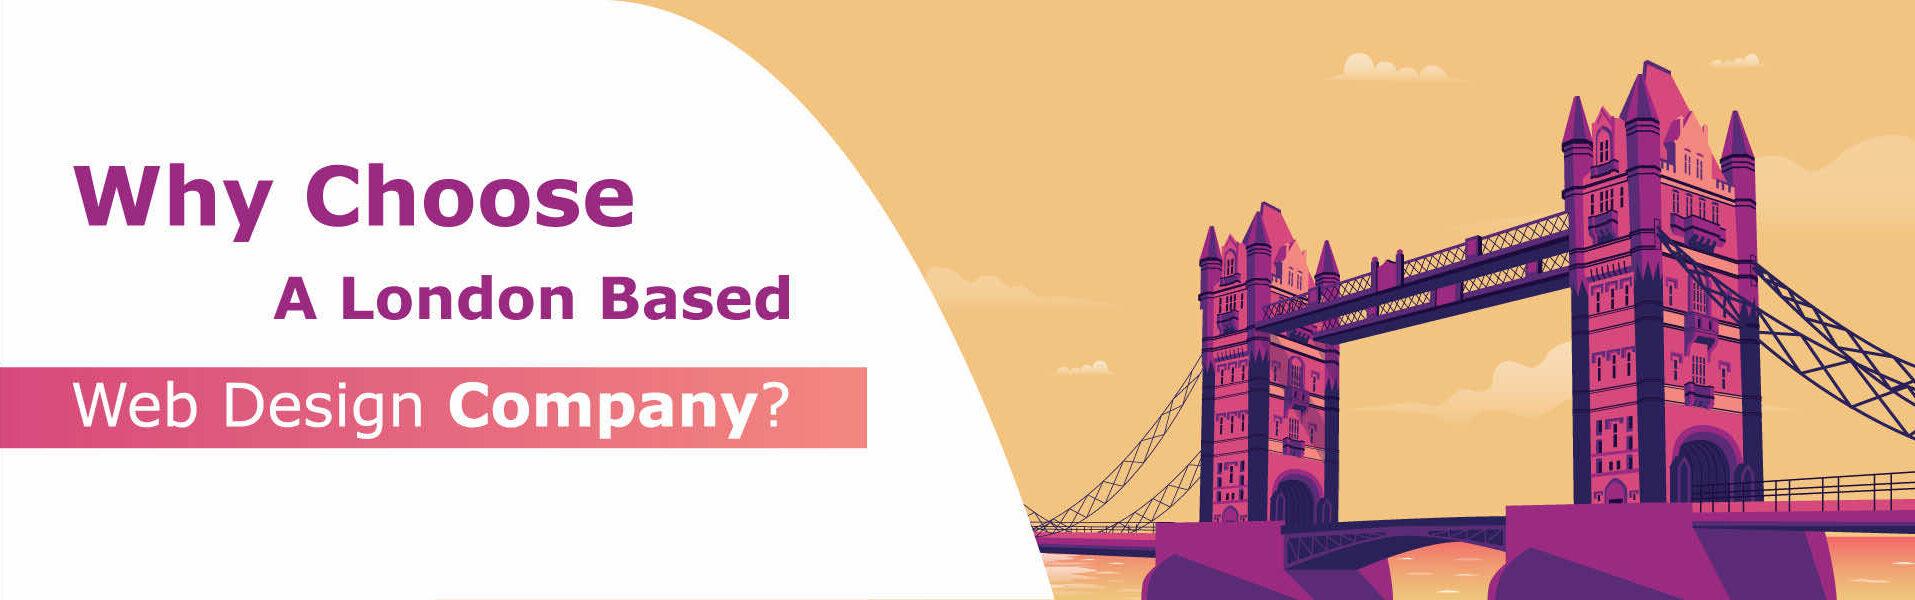 why choose a London web design